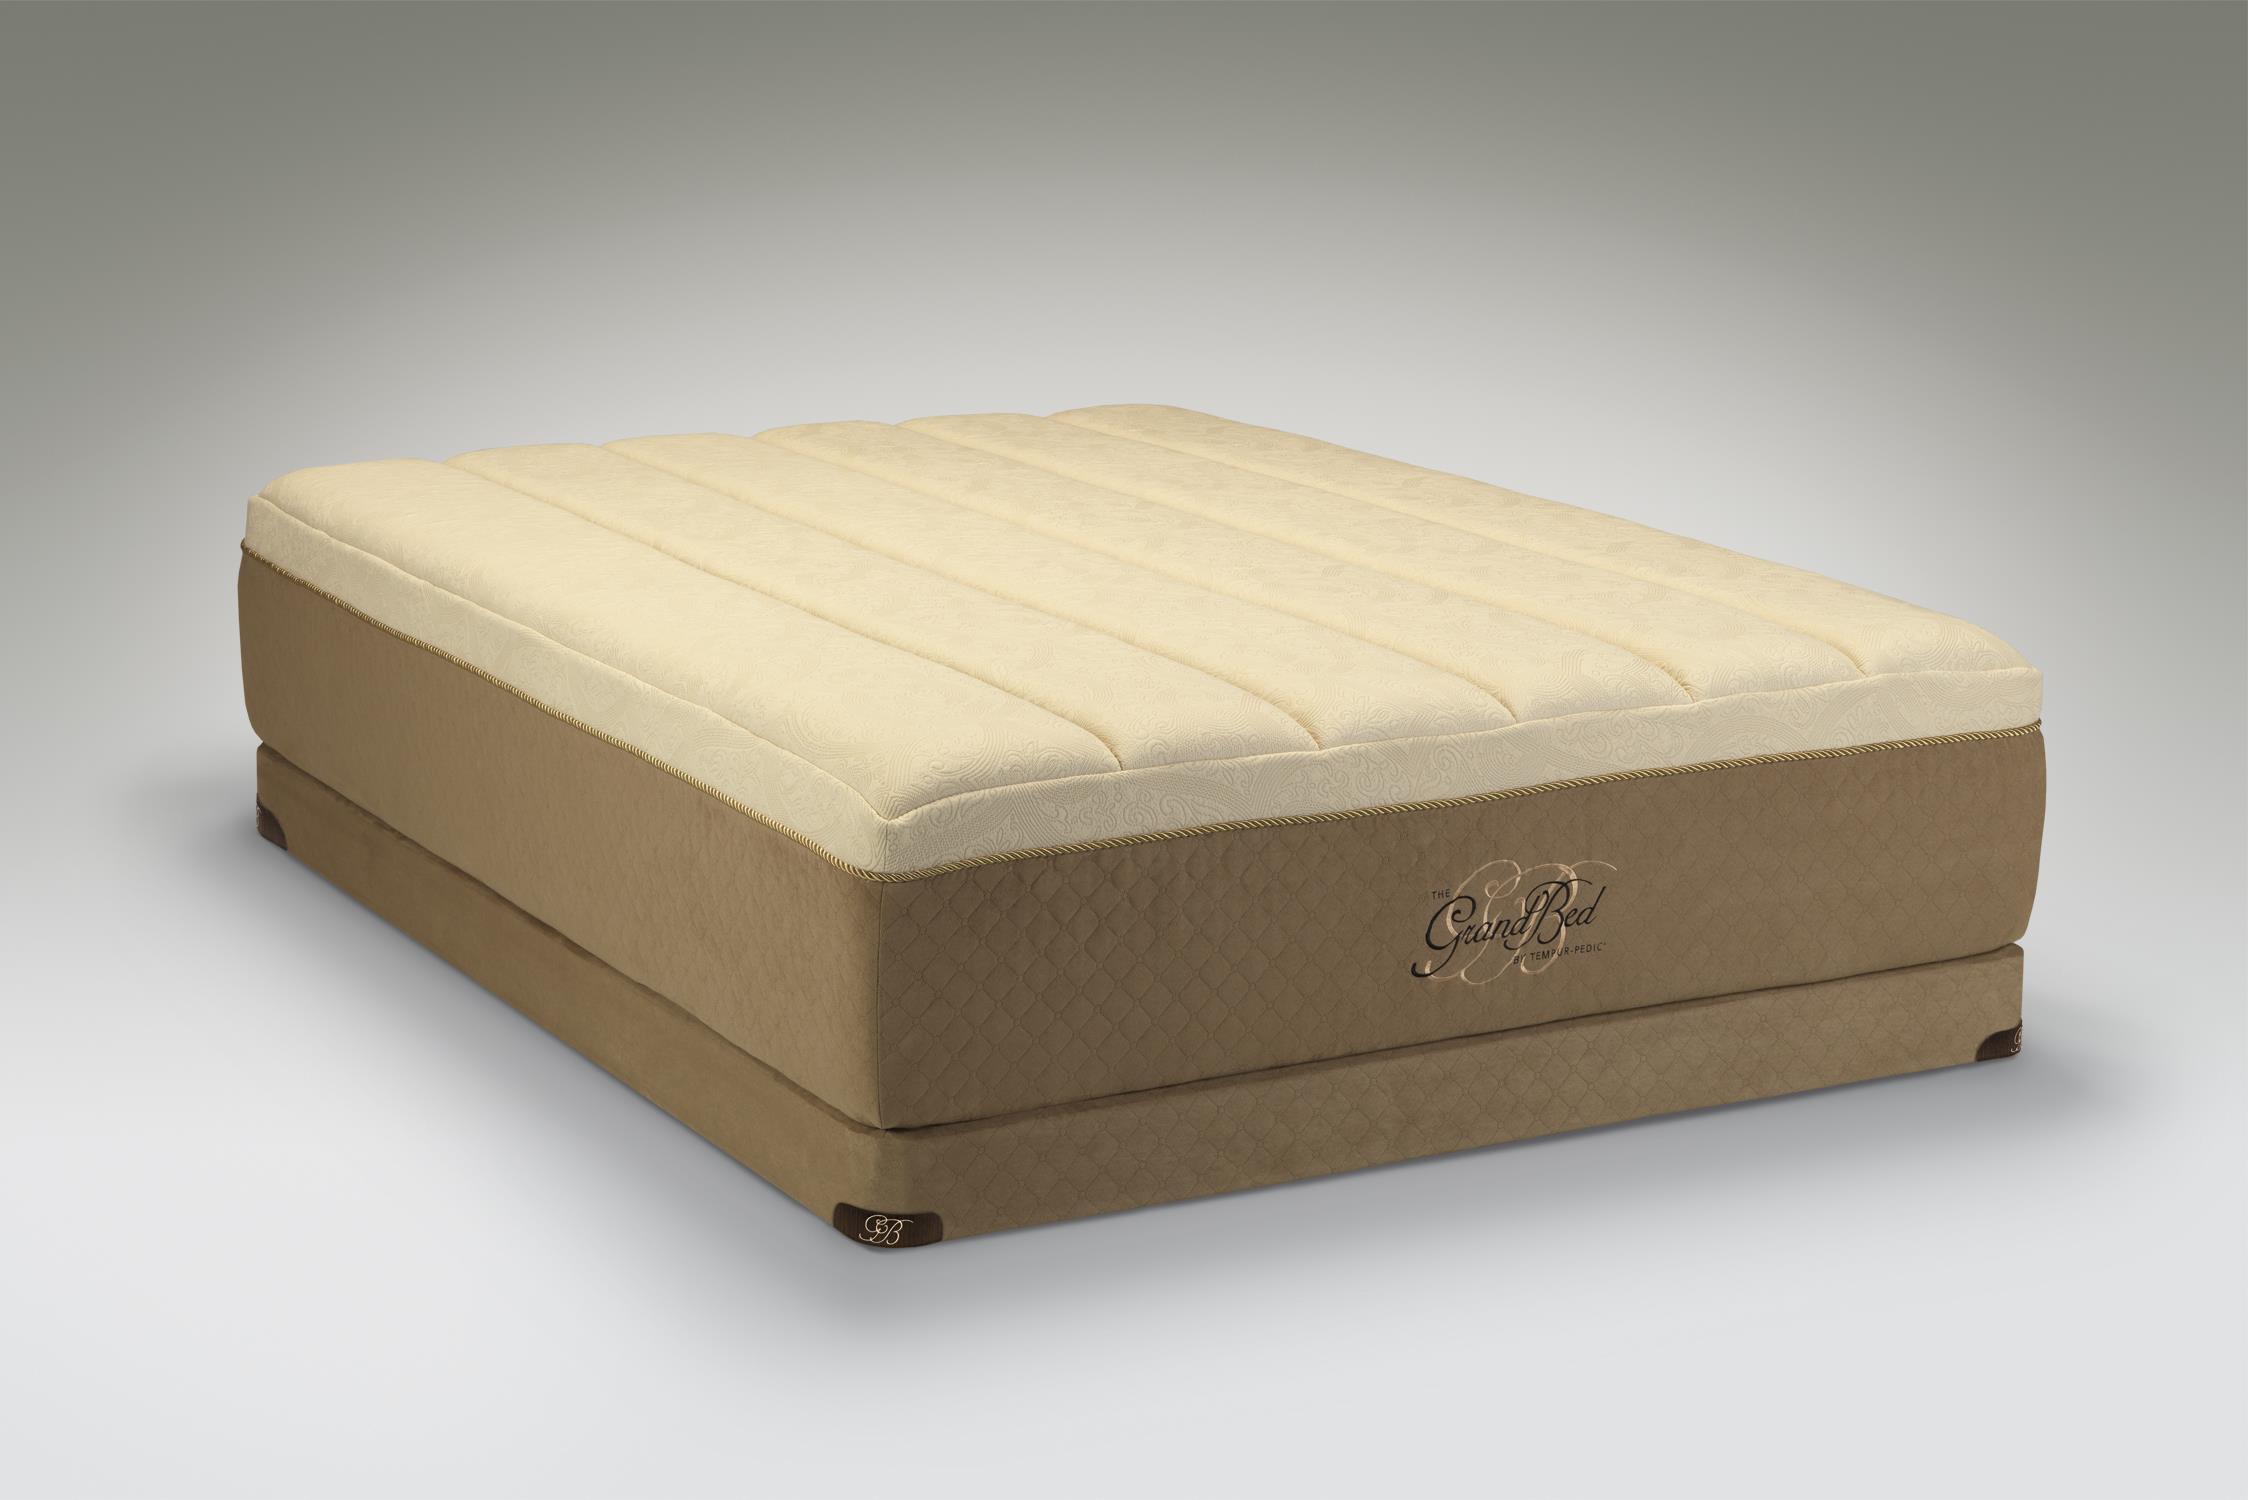 Tempur-Pedic® The GrandBed Queen Medium-Soft Mattress Set - Item Number: 10185250+21515150